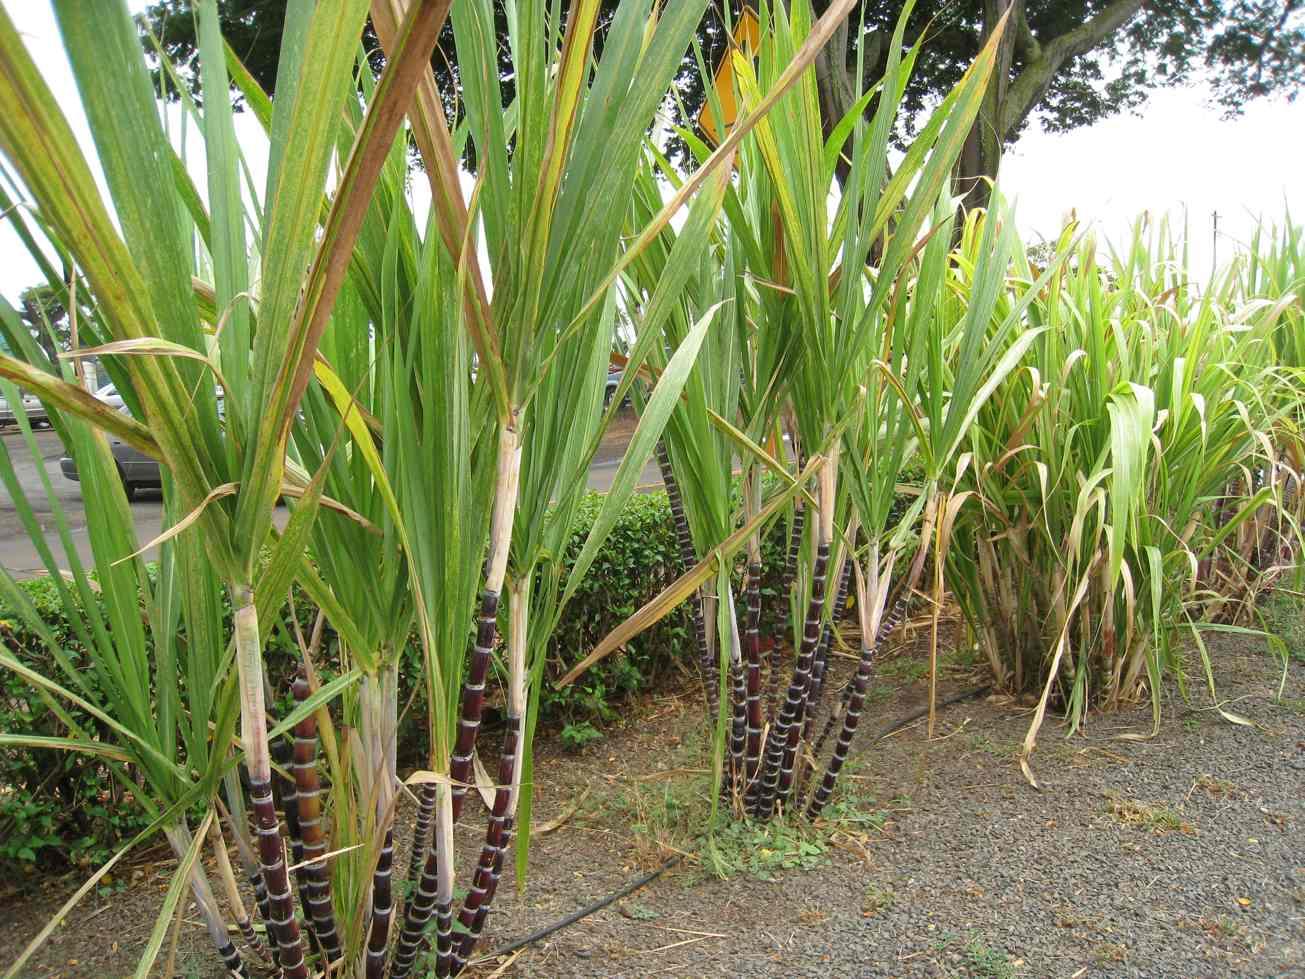 Sugarcane Wallpapers 1305x979